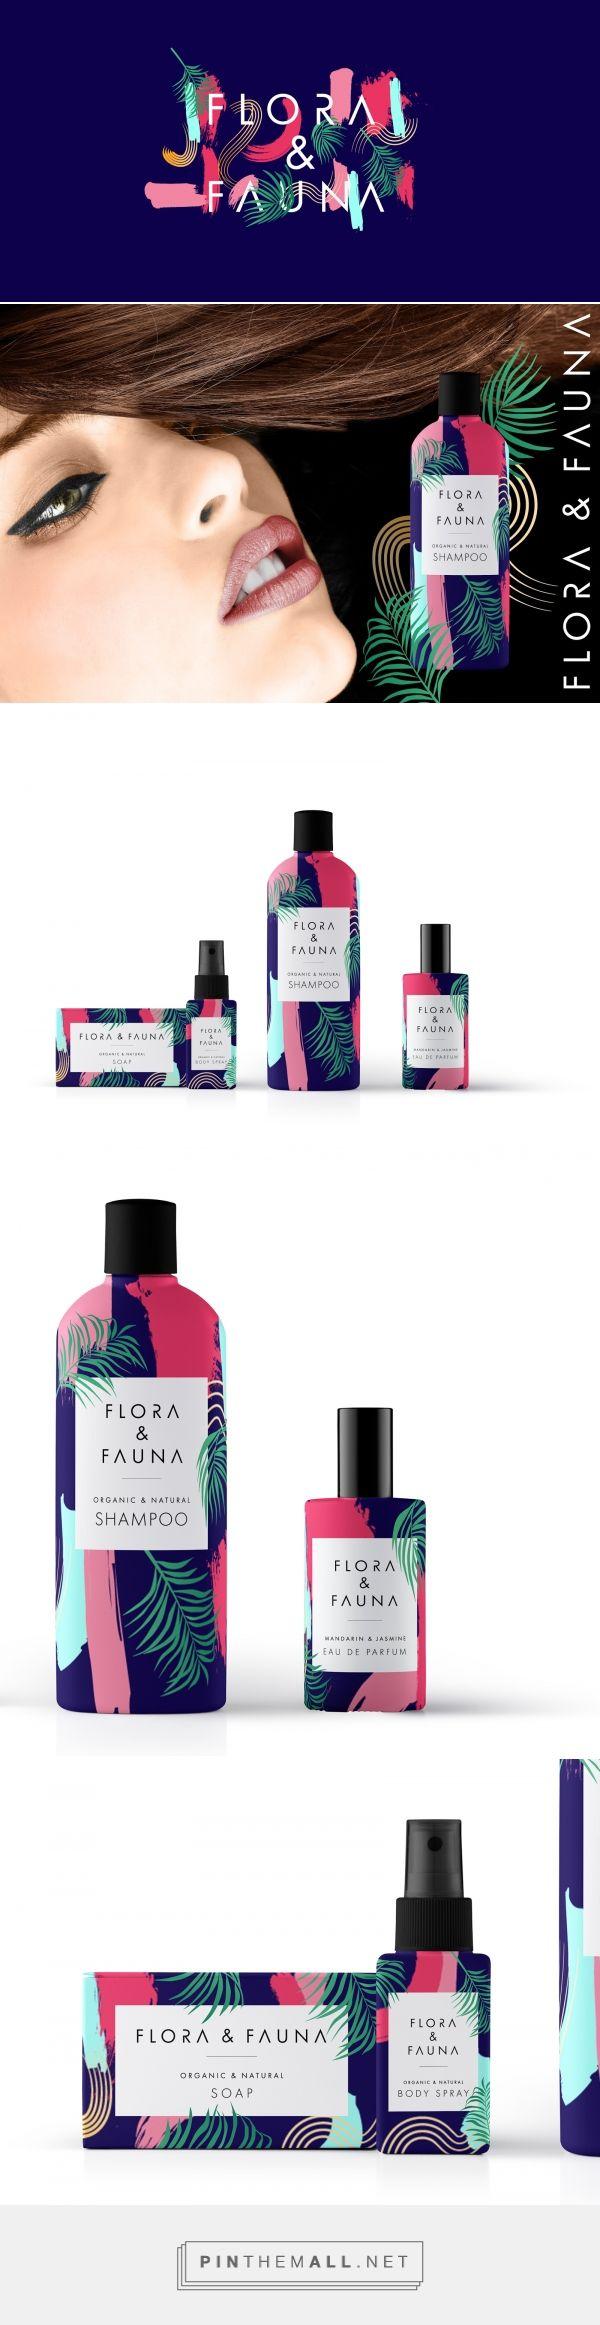 Flora & Fauna - Packaging of the World - Creative Package Design Gallery - http://www.packagingoftheworld.com/2018/01/flora-fauna.html